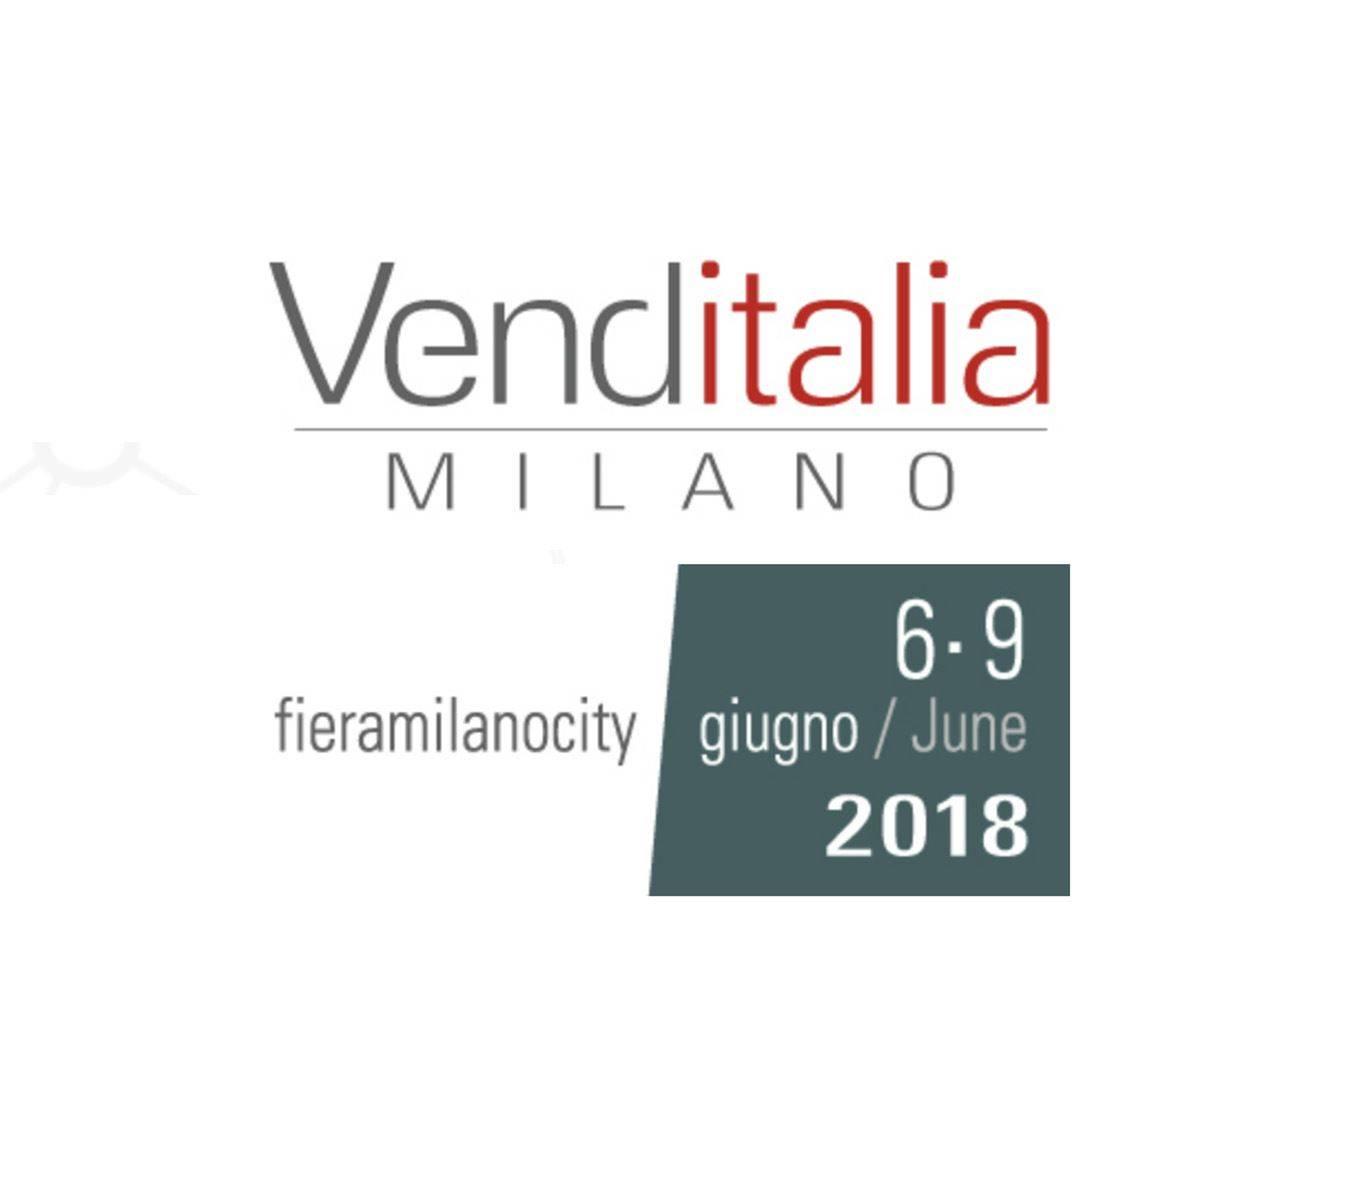 Venditalia 2018